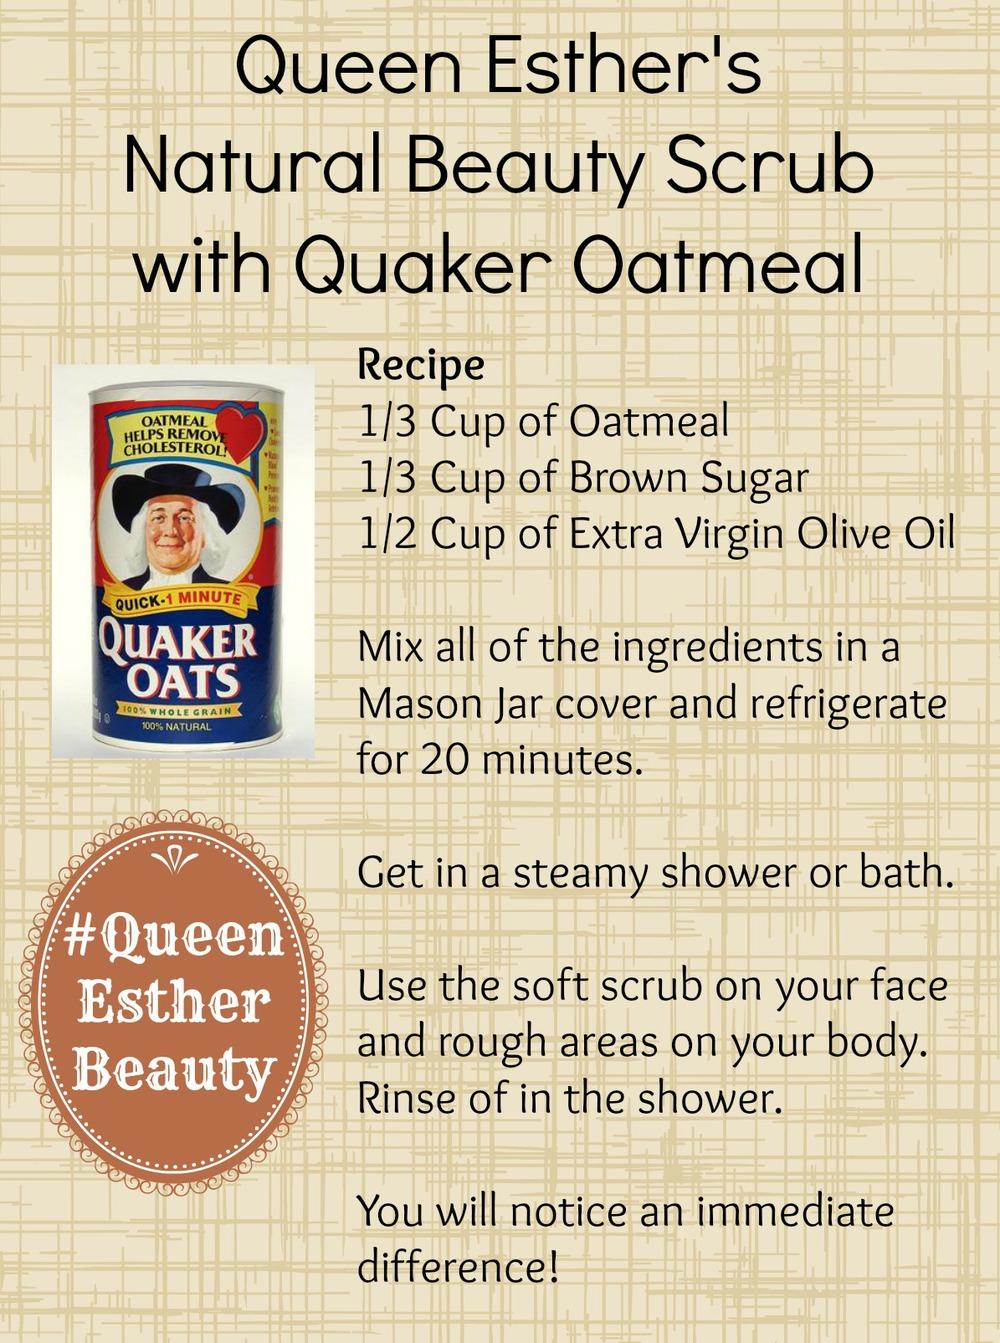 #QueenEstherBeauty ClassyBlackGirl.com Quaker Oatmeal Oats Skin